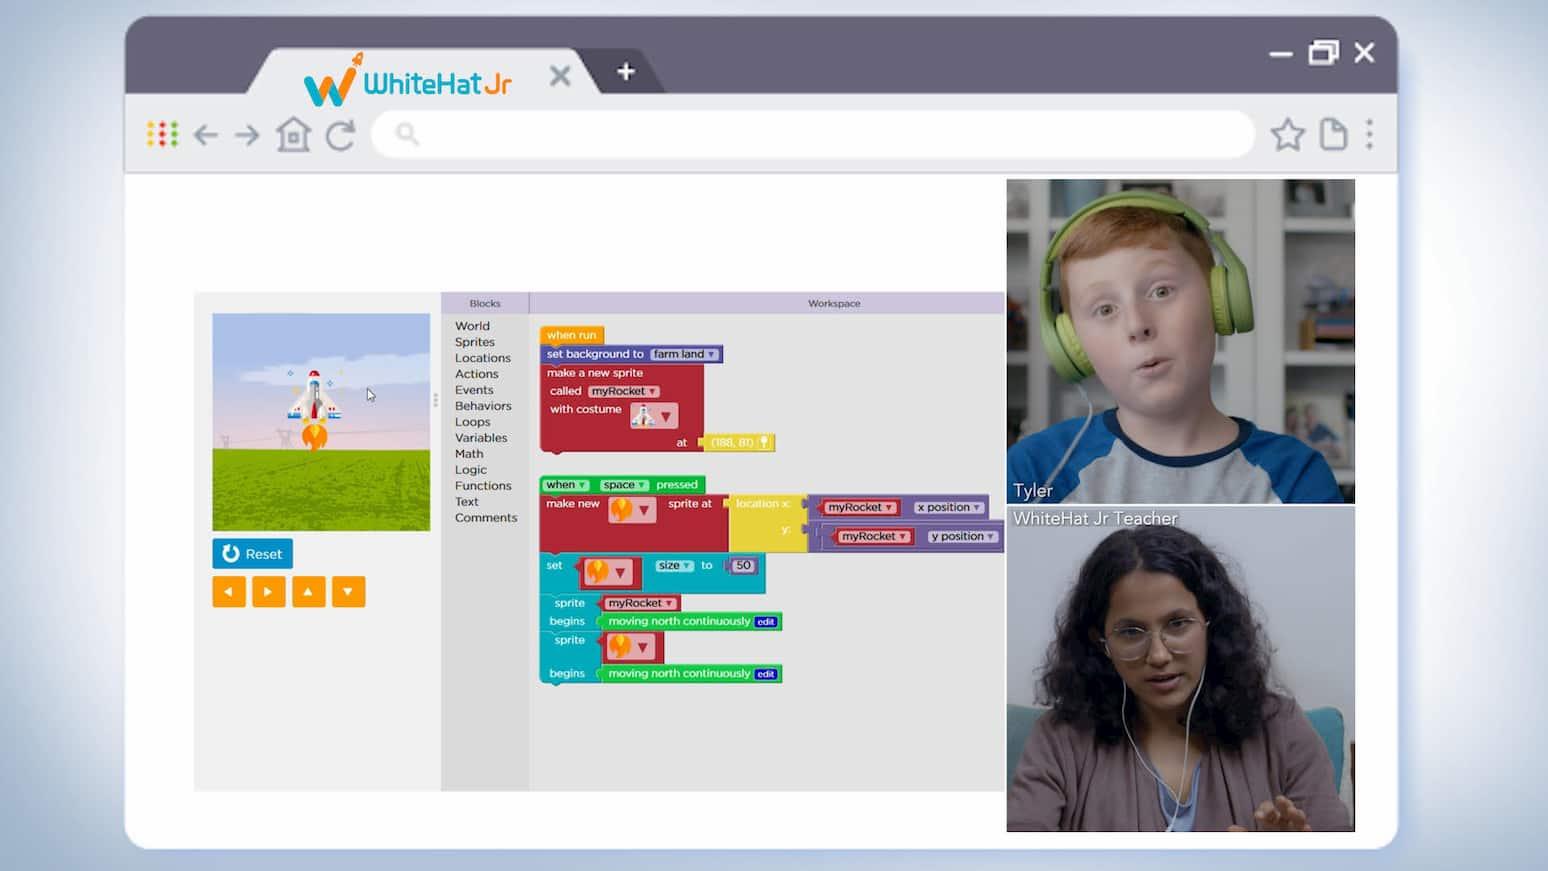 whitehat jr coding classes